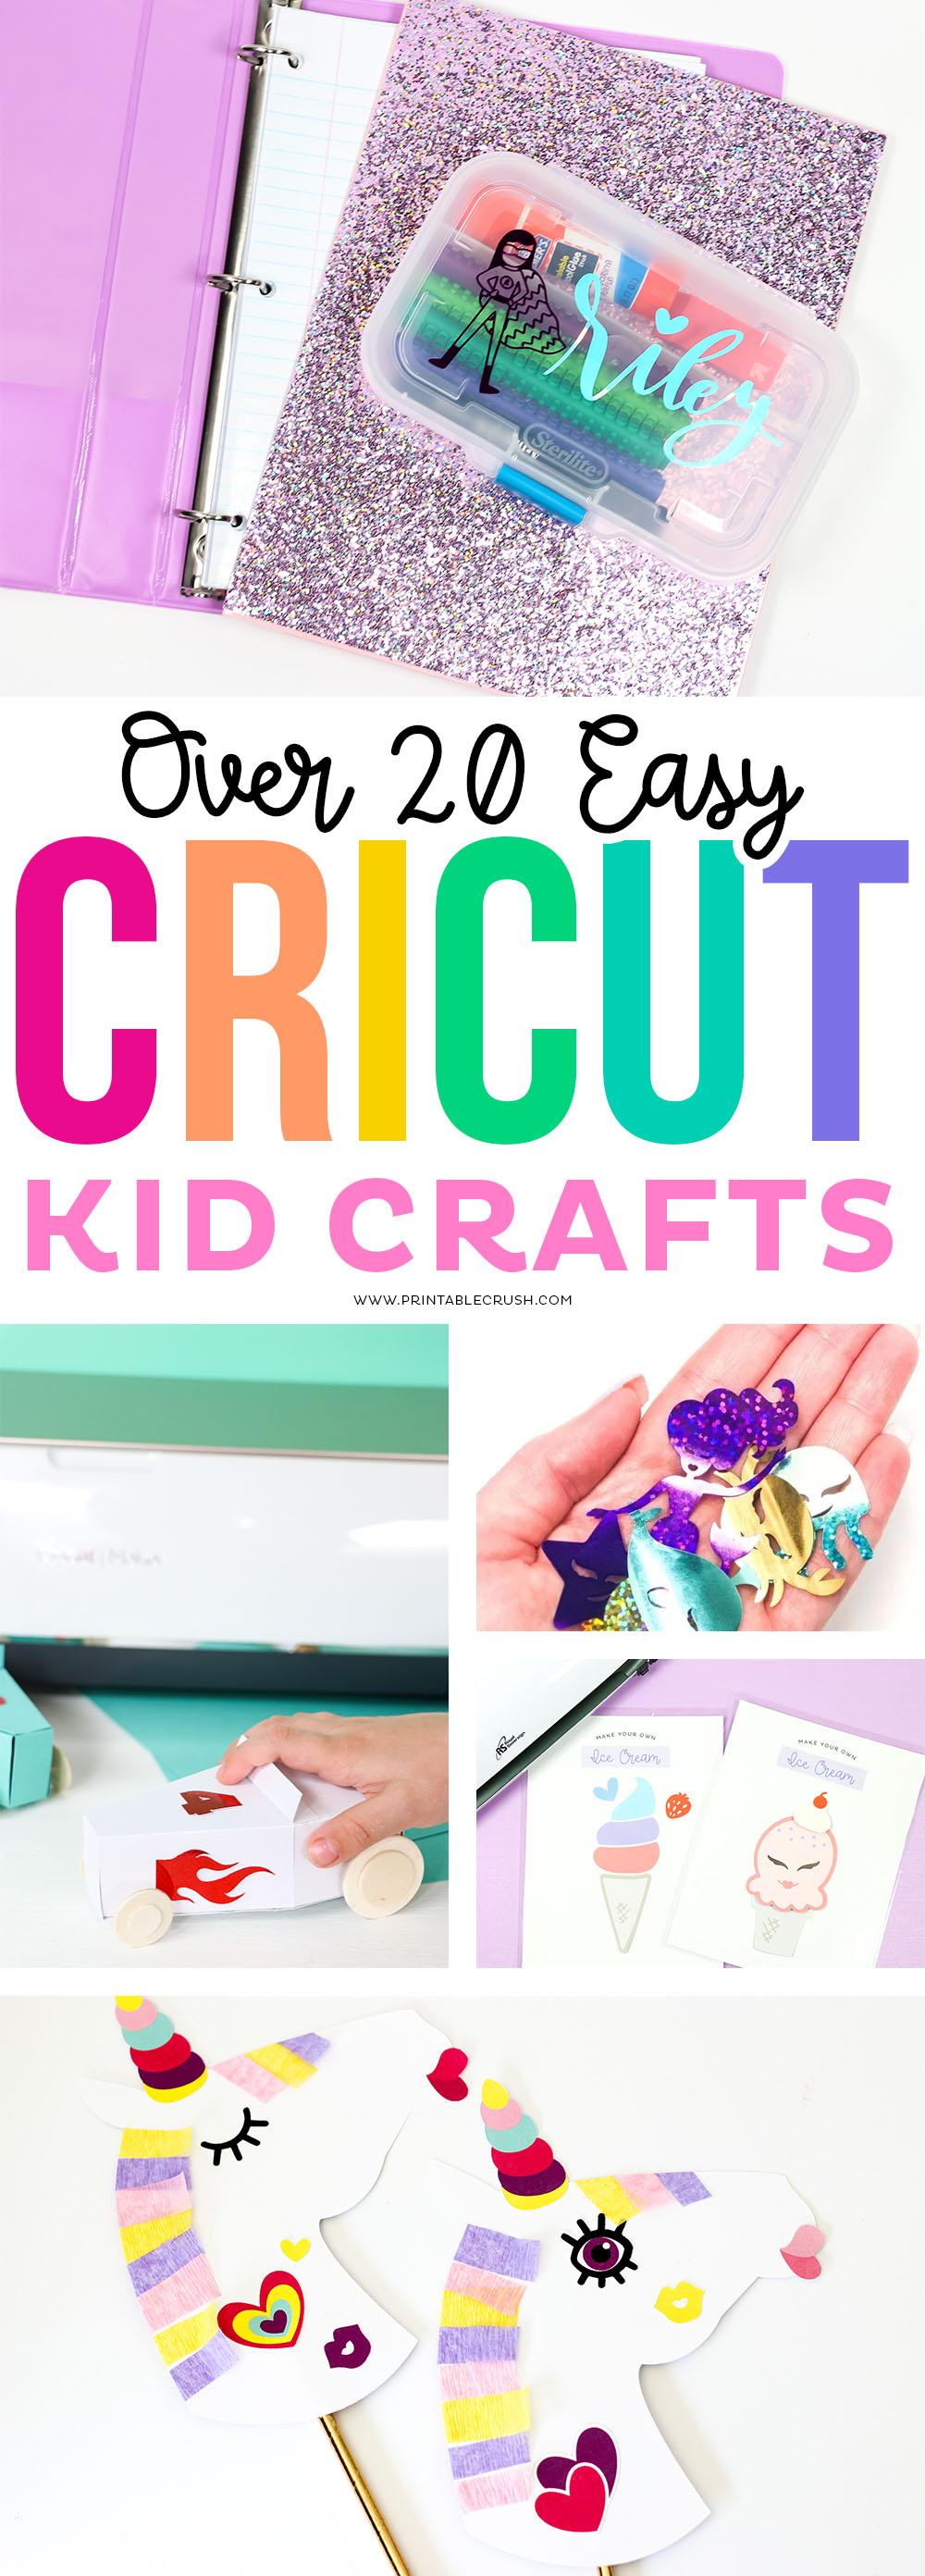 Easy Cricut Kid Crafts via @printablecrush